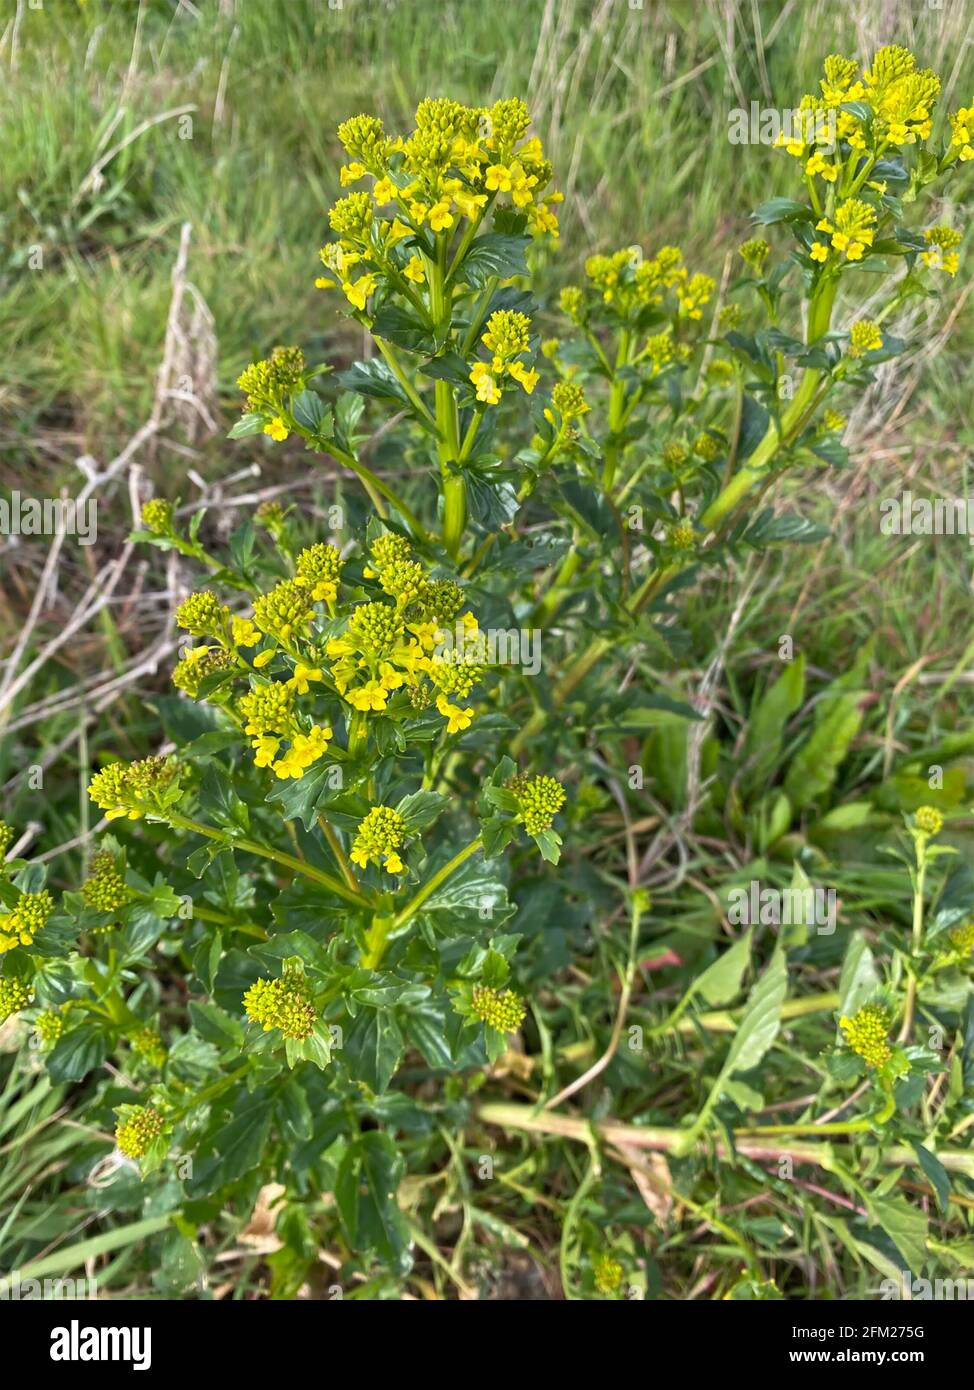 BITTERCRESS Barbarea vulgaris Biennale Herb.Photo: Tony Gale Foto Stock